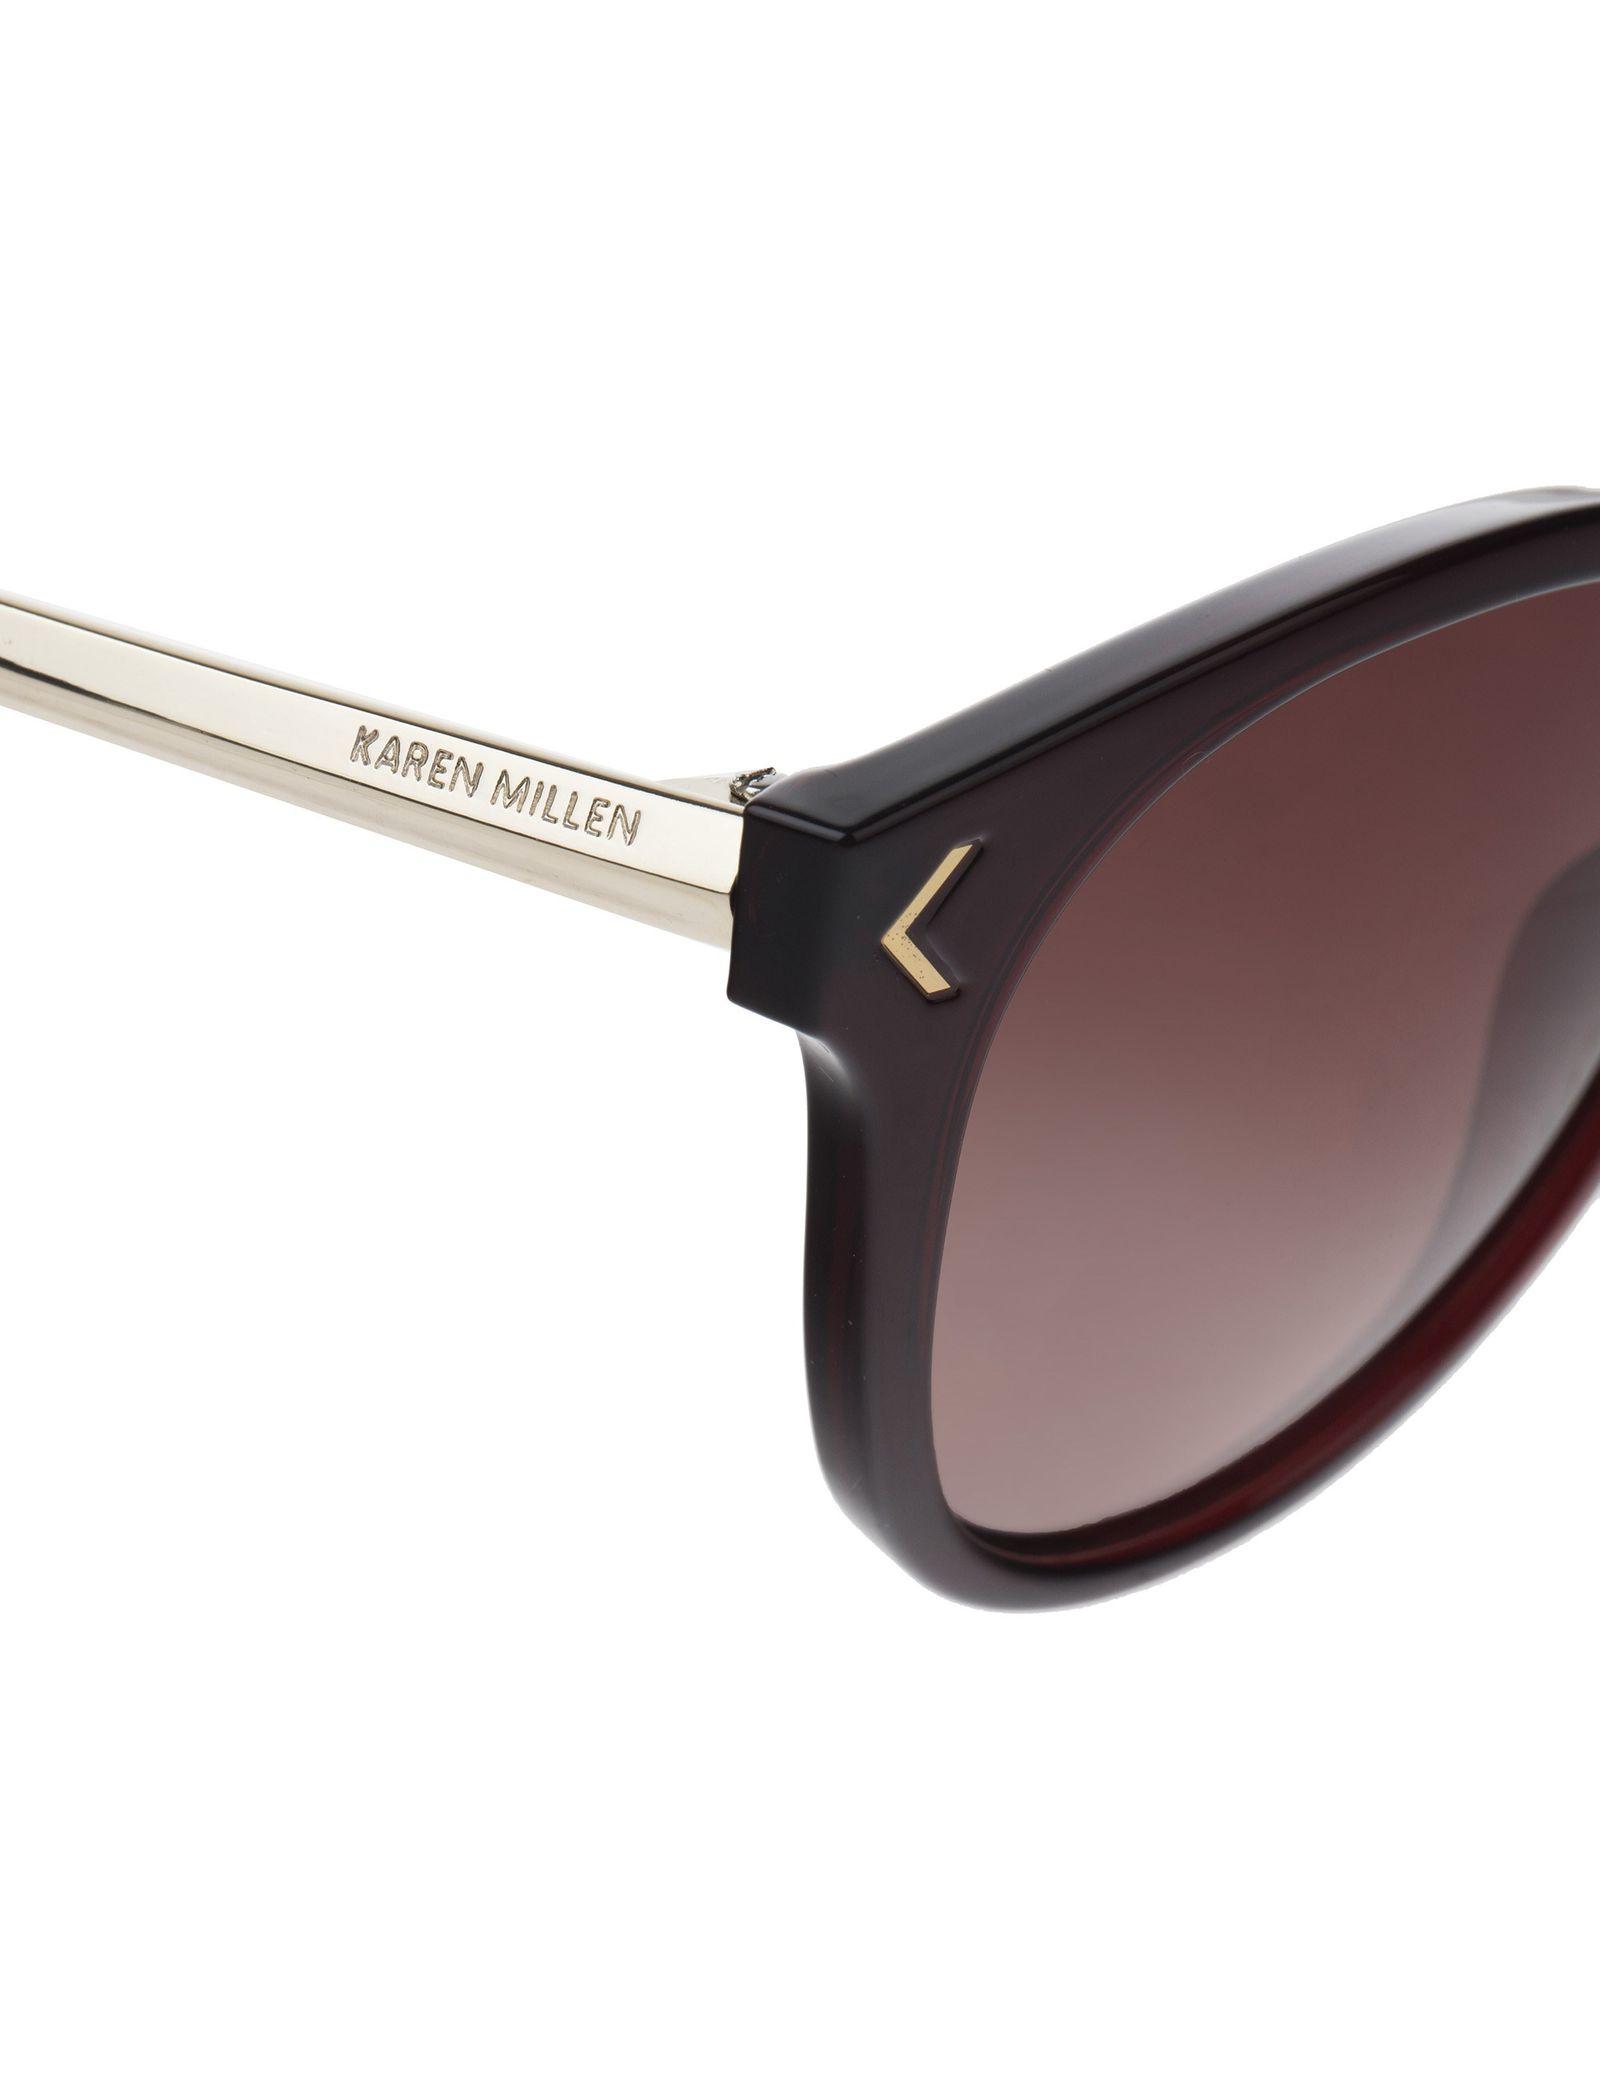 عینک آفتابی ویفرر زنانه - کارن میلن - قهوه اي - 6